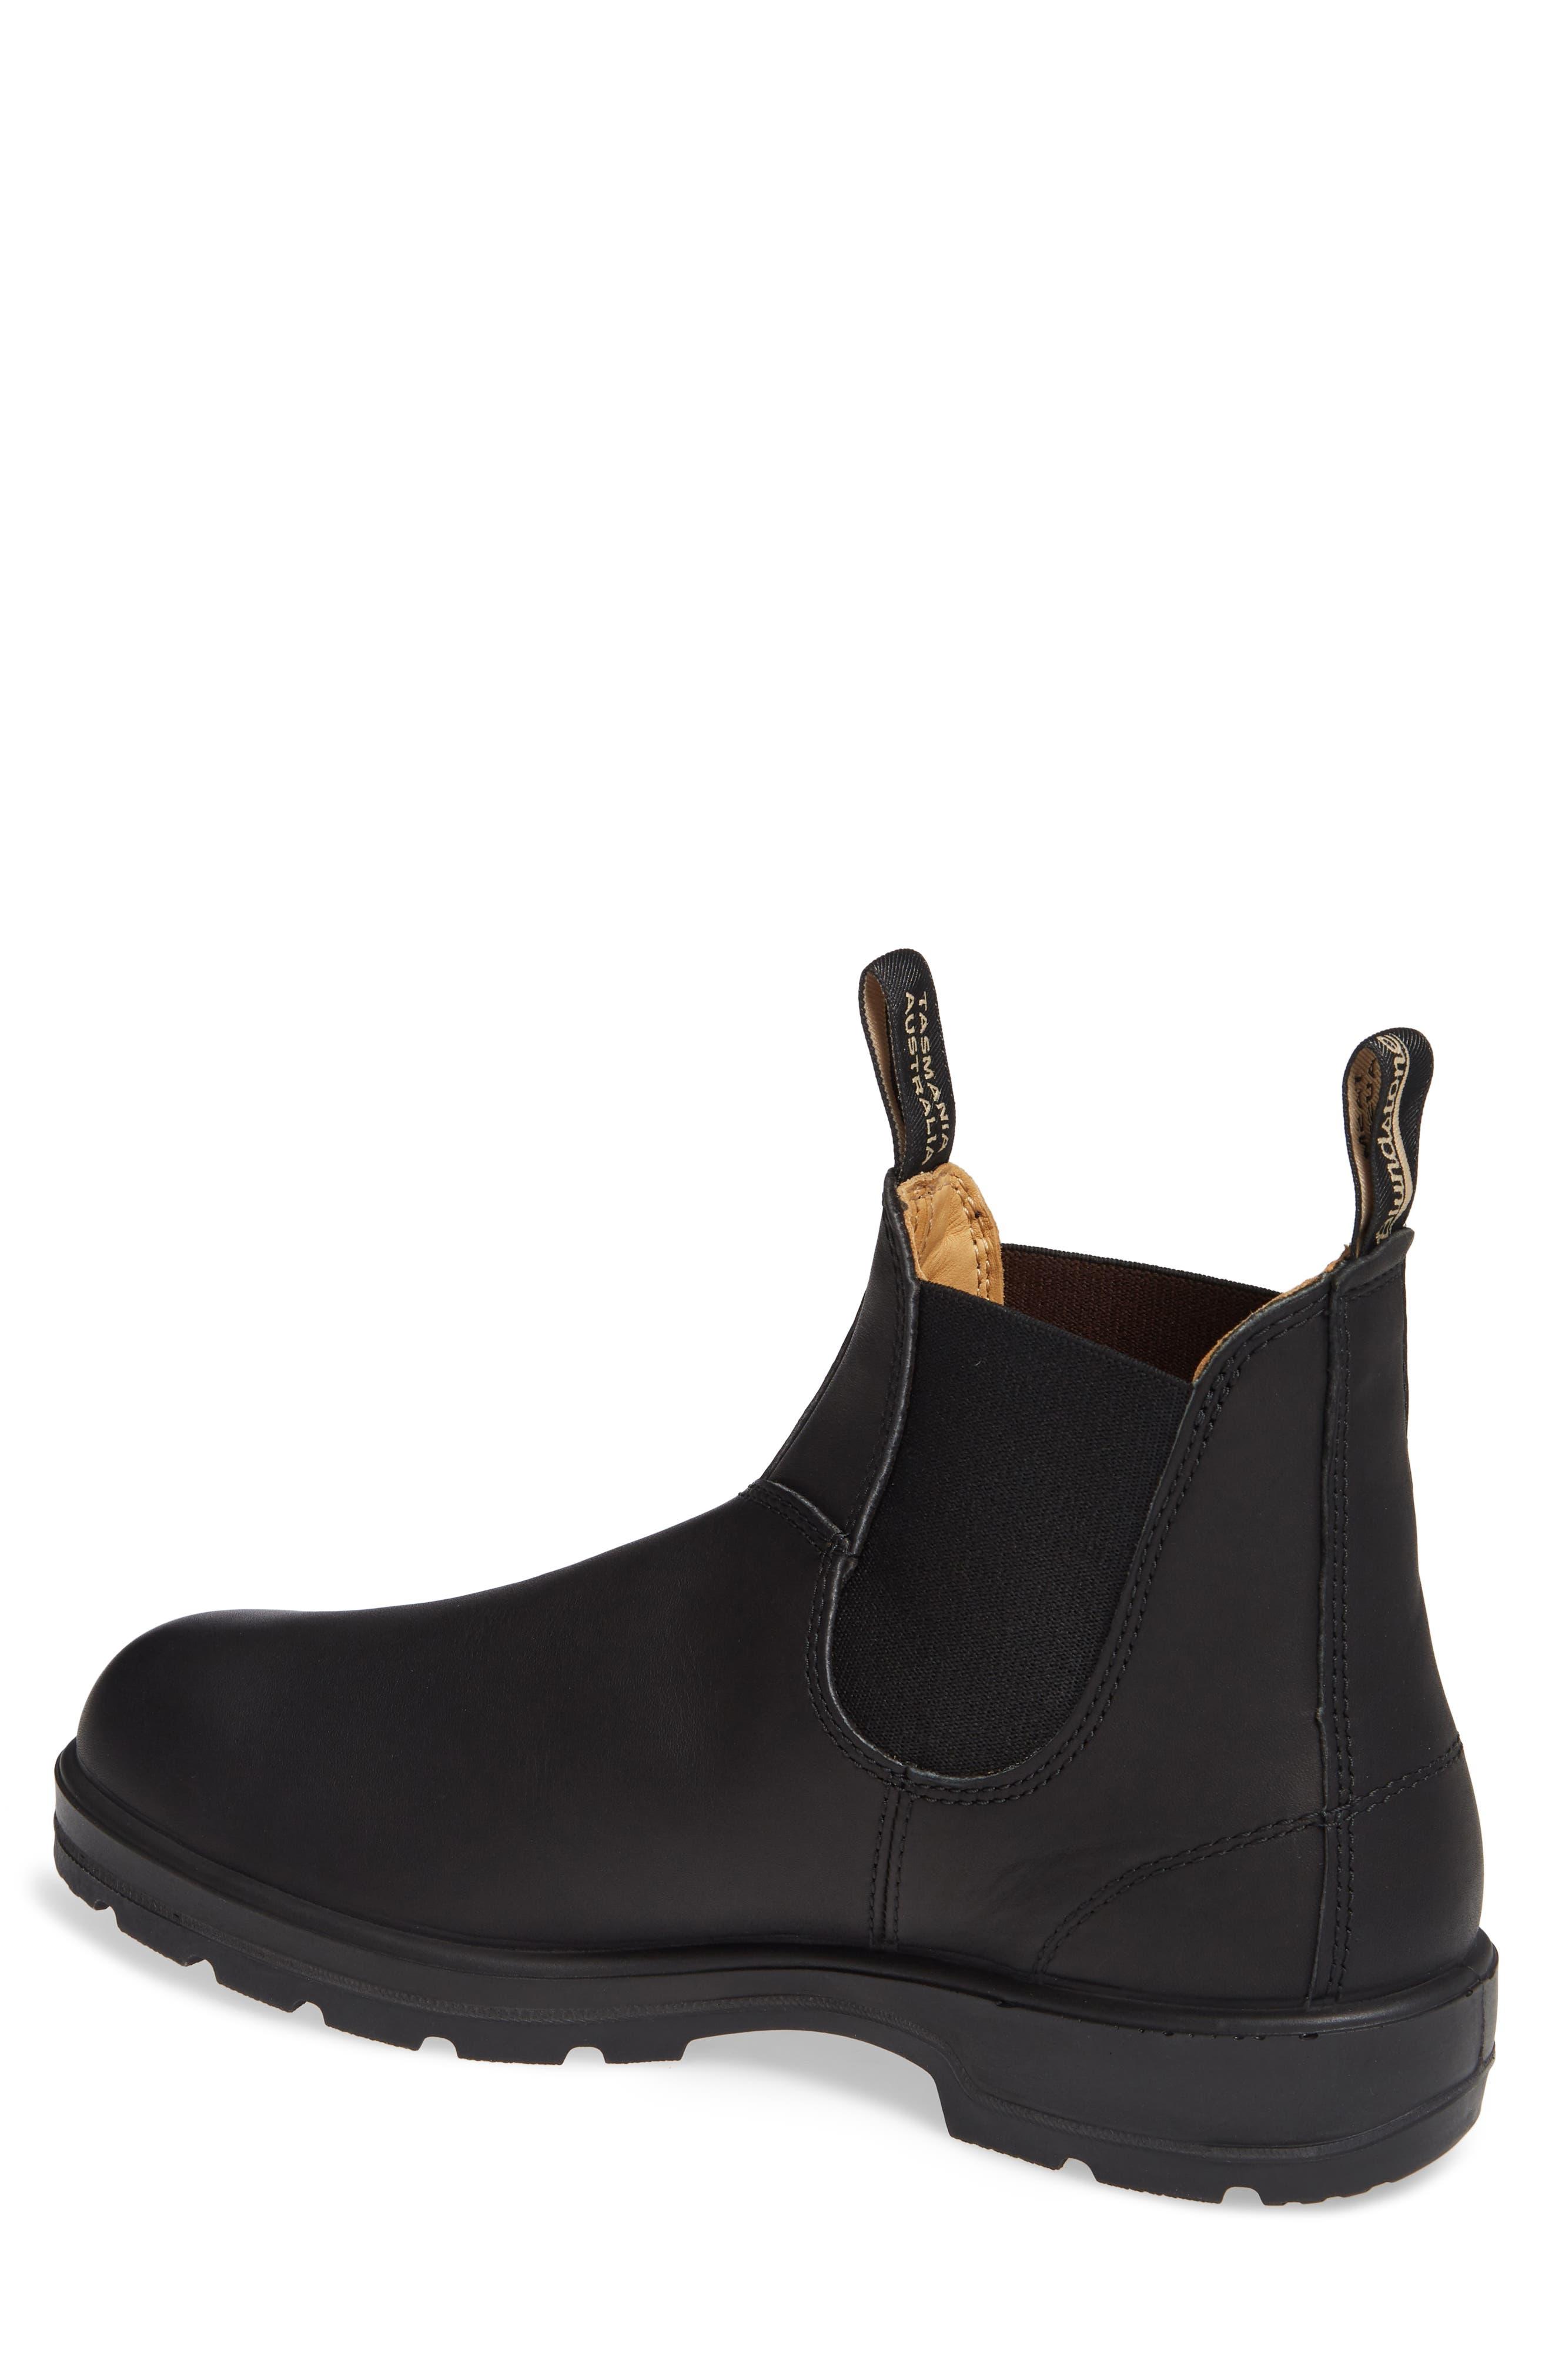 Footwear Chelsea Boot,                             Alternate thumbnail 2, color,                             BLACK